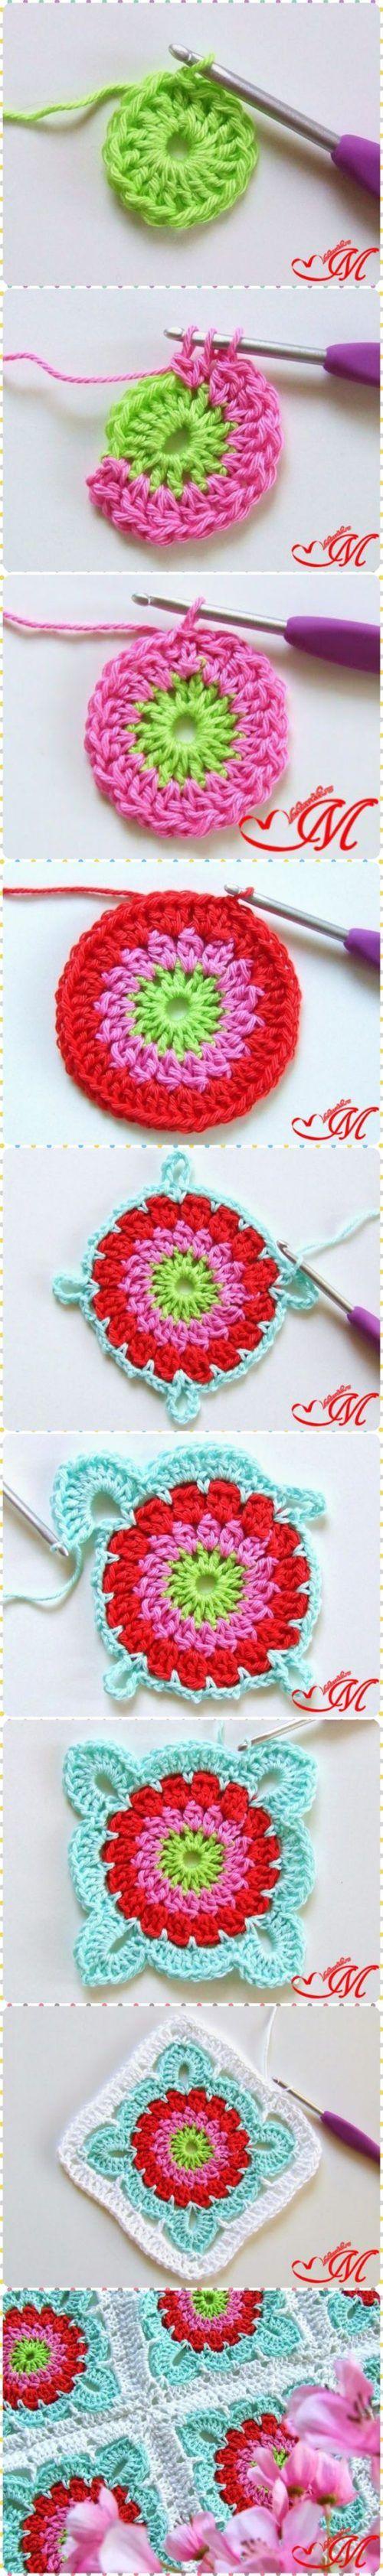 Crochet Granny Square Flowers